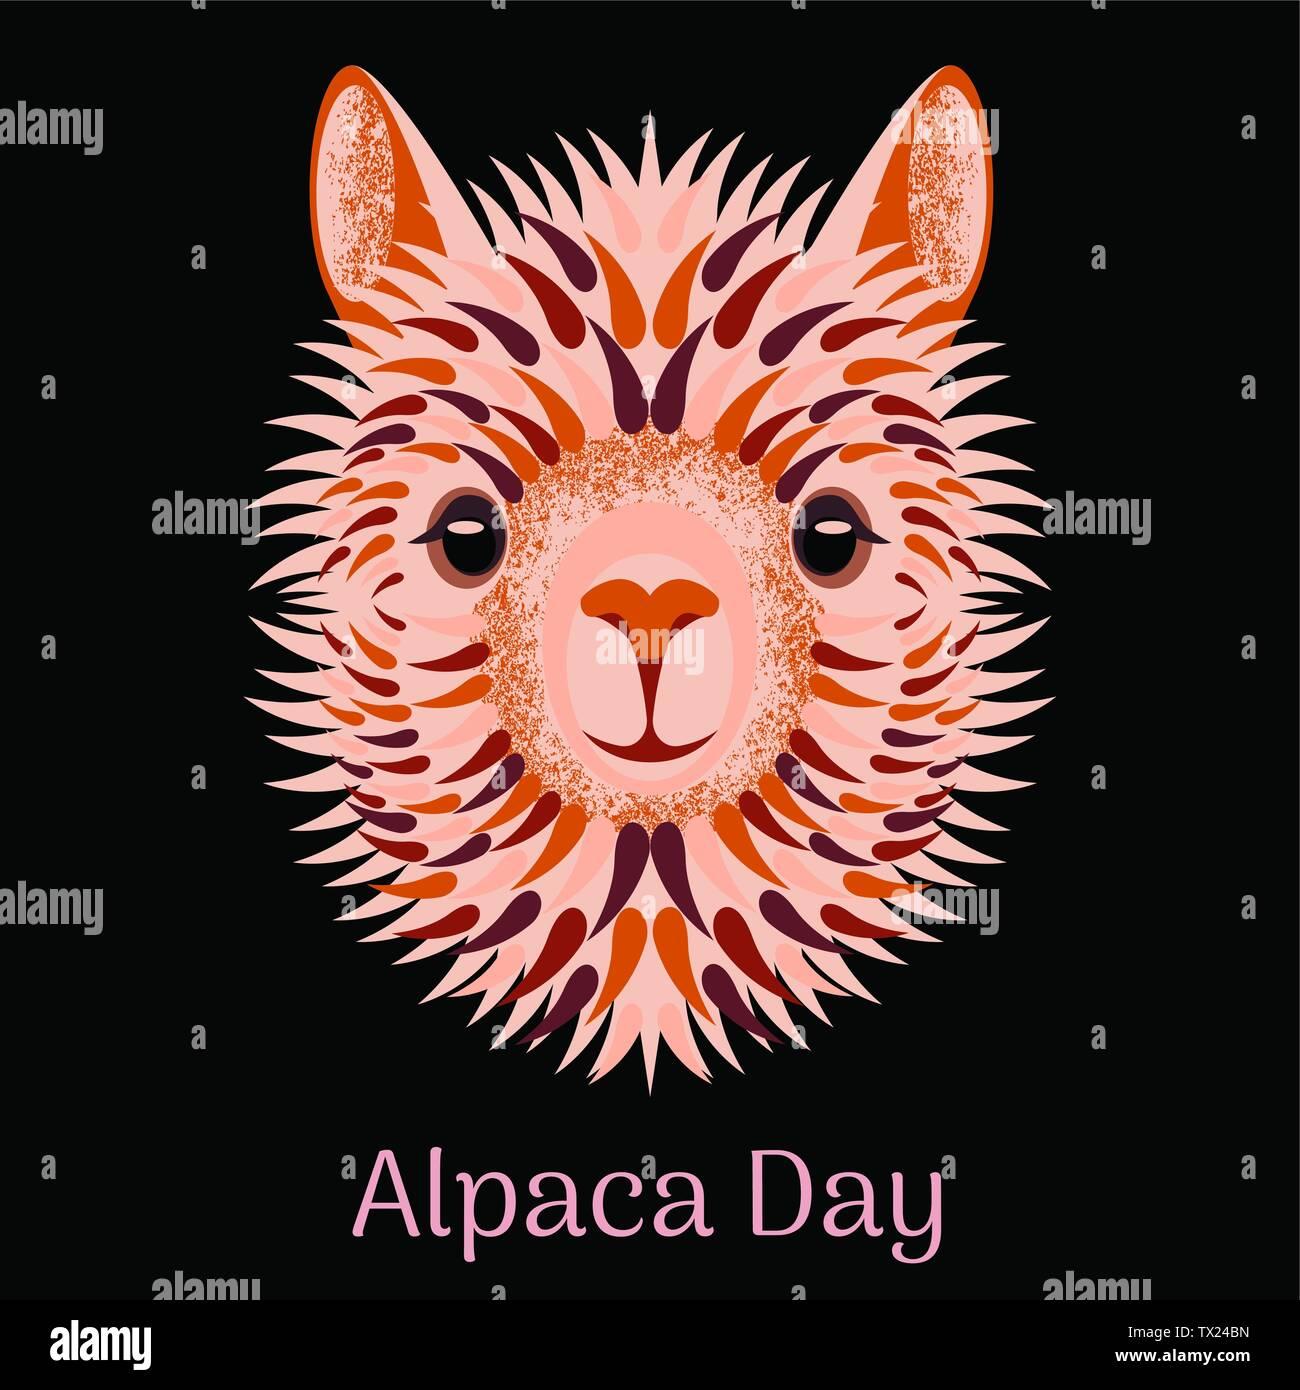 Alpaca Day. National holiday in Peru. Blonde Head, face, alpaca portrait - Stock Vector